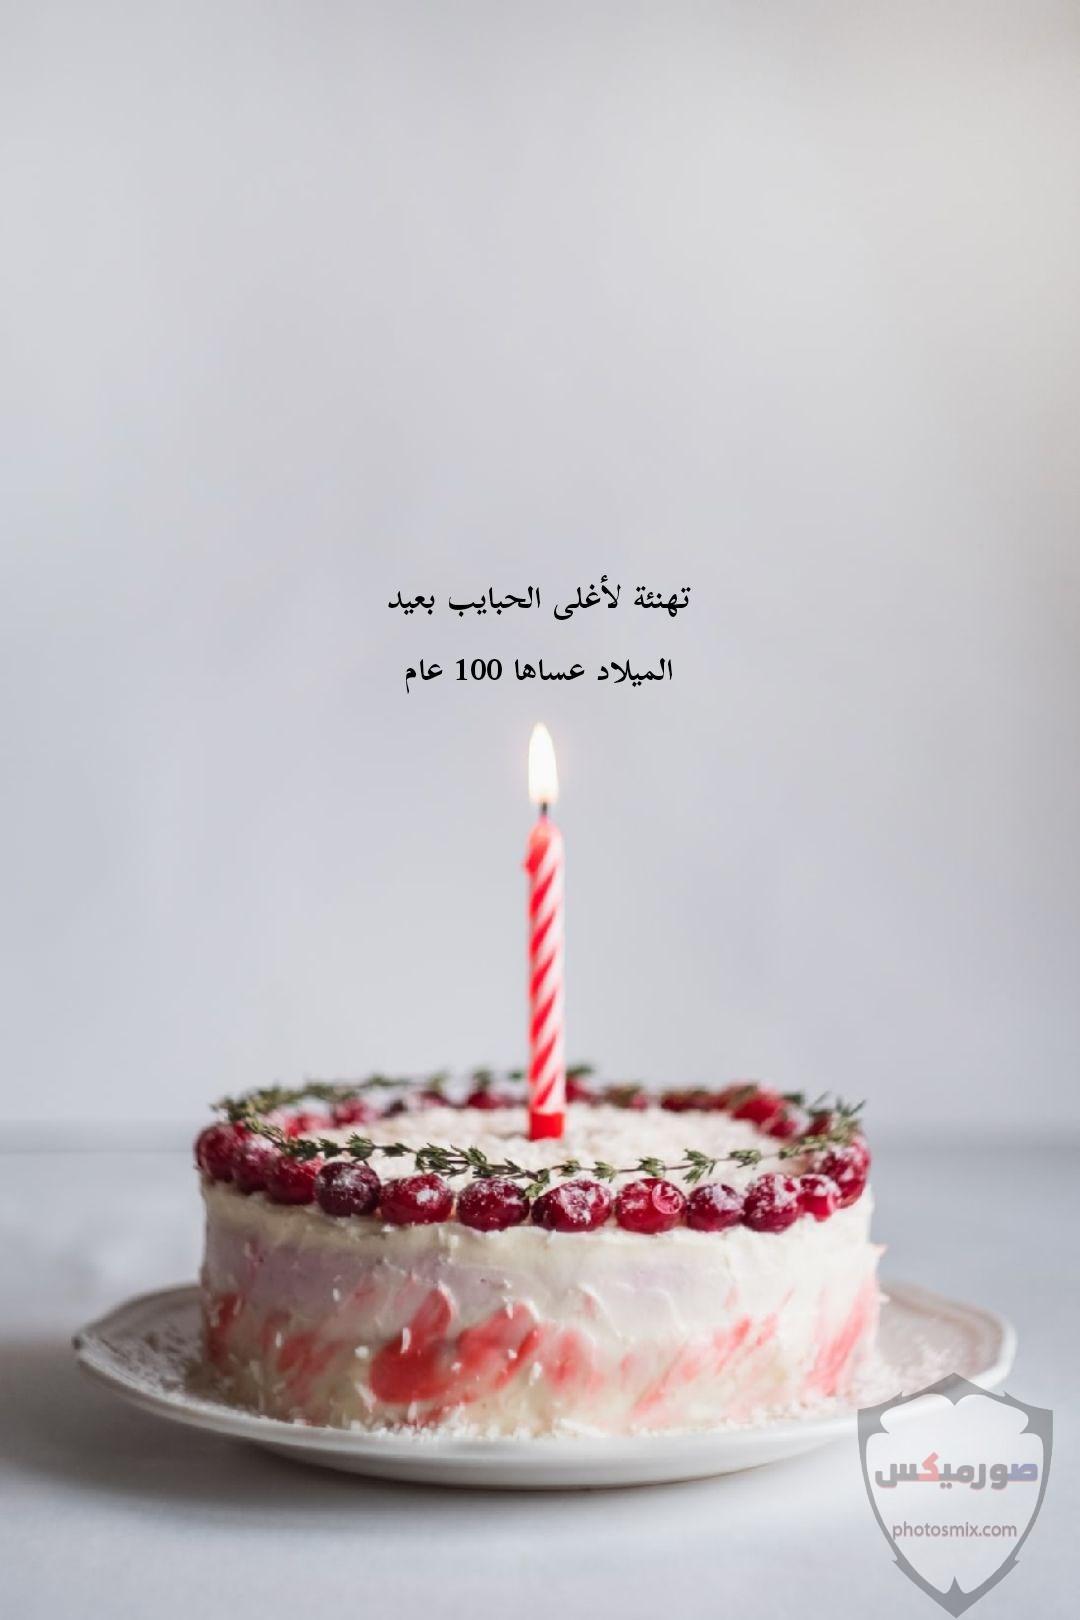 صور عيد ميلاد 2020 تحميل صور تورتة تهنئة عيد ميلاد 2021 اجمل صور اعياد ميلاد 20